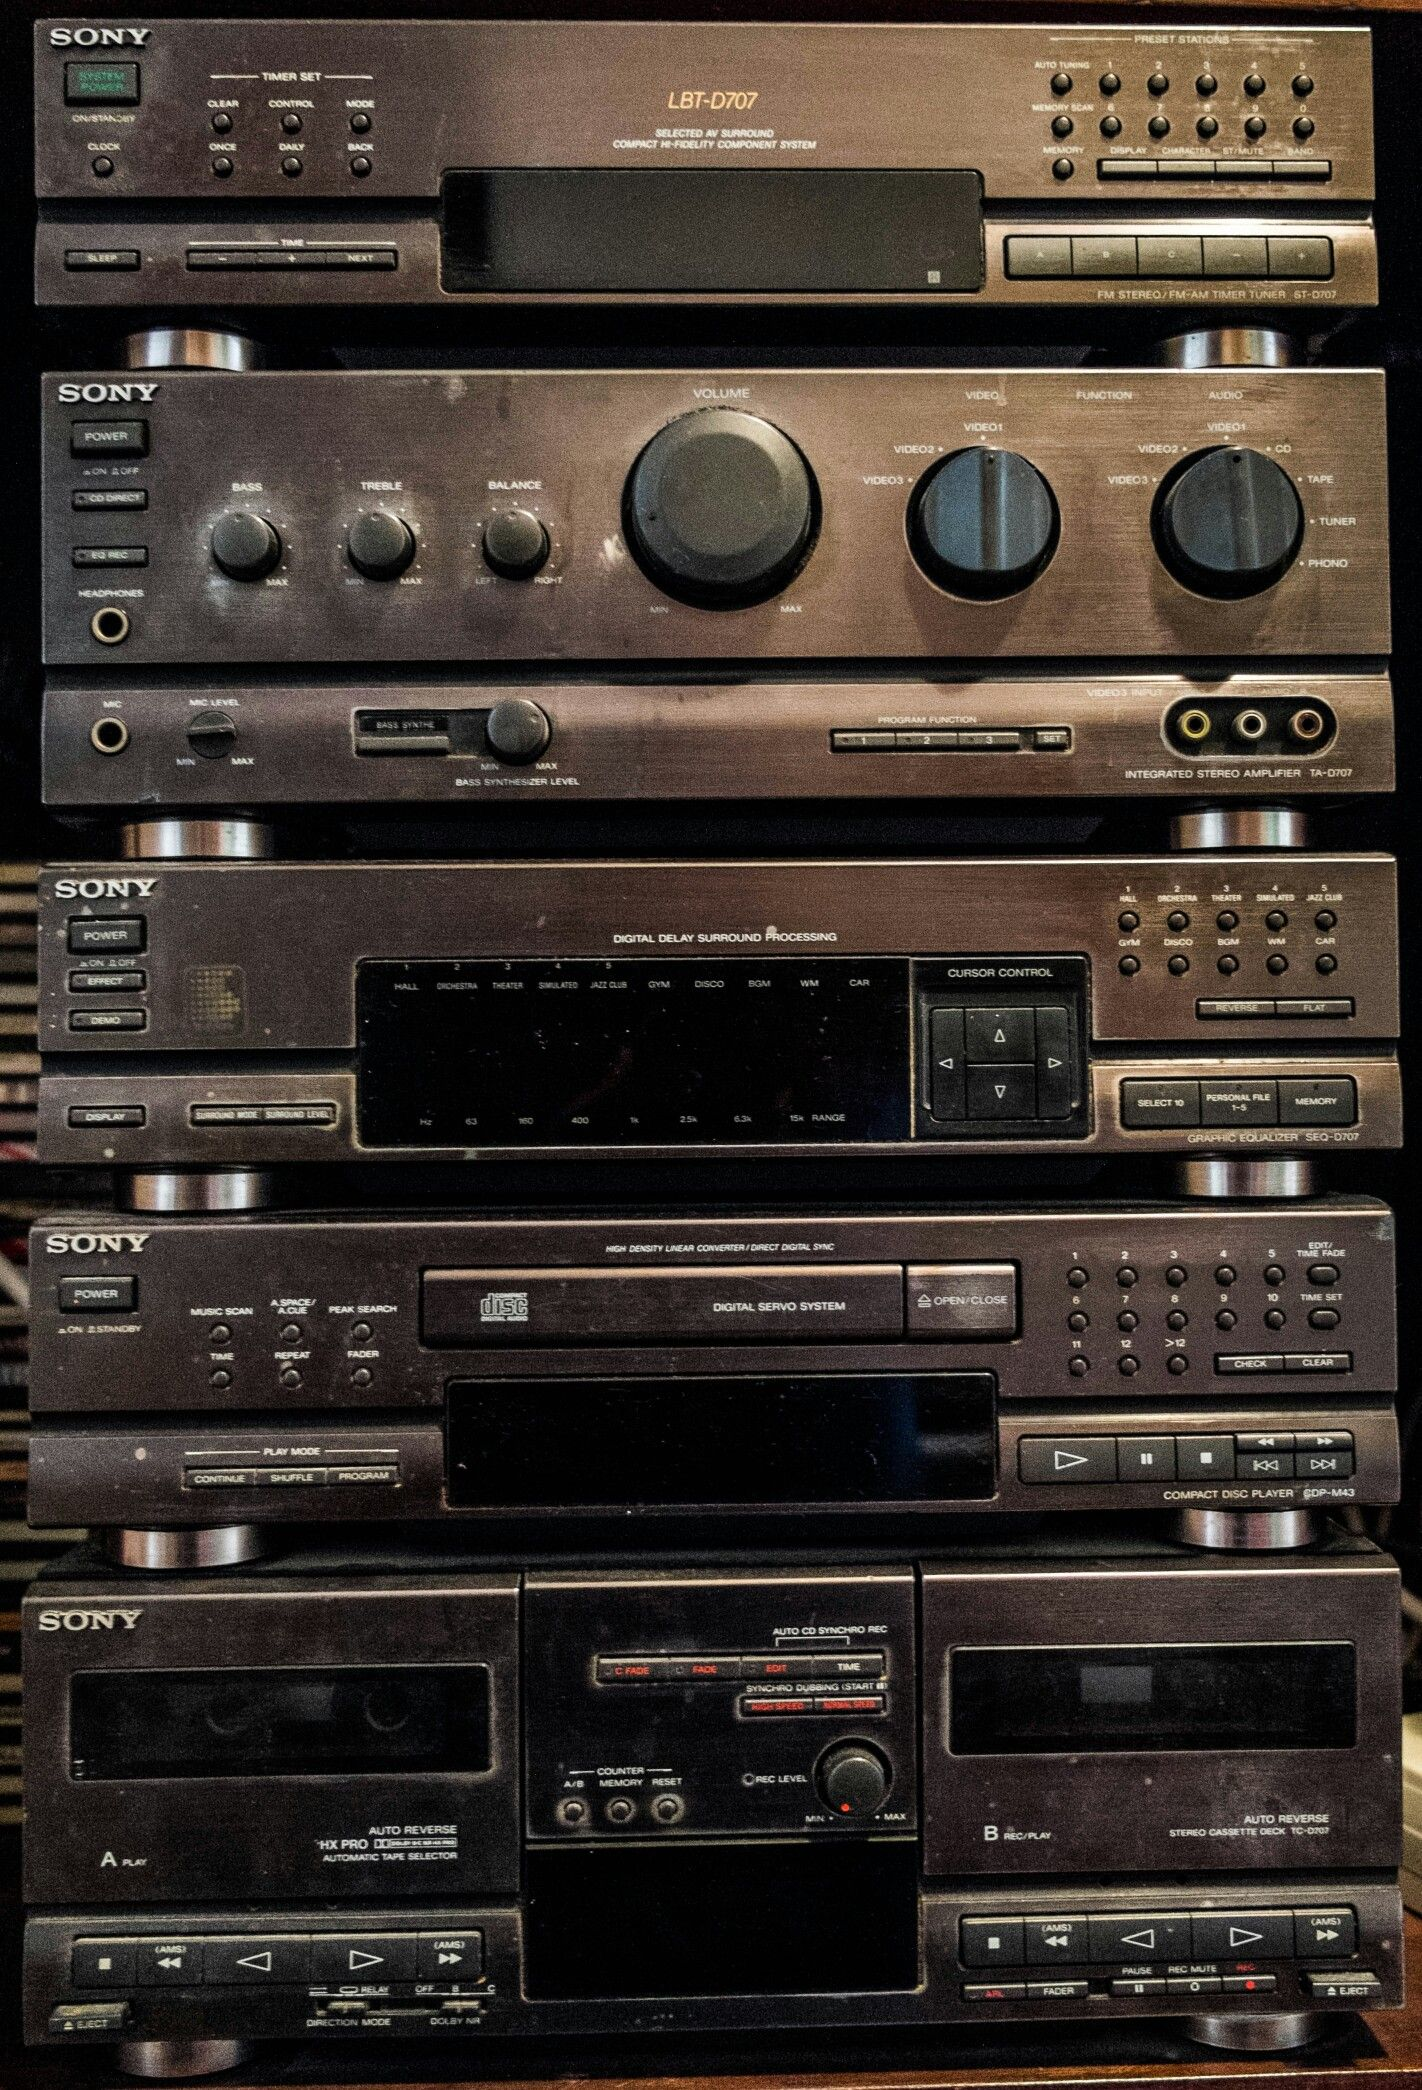 Sony Vintage Hifi Sony Lbt D707 Hifi Audio Hifi Vintage